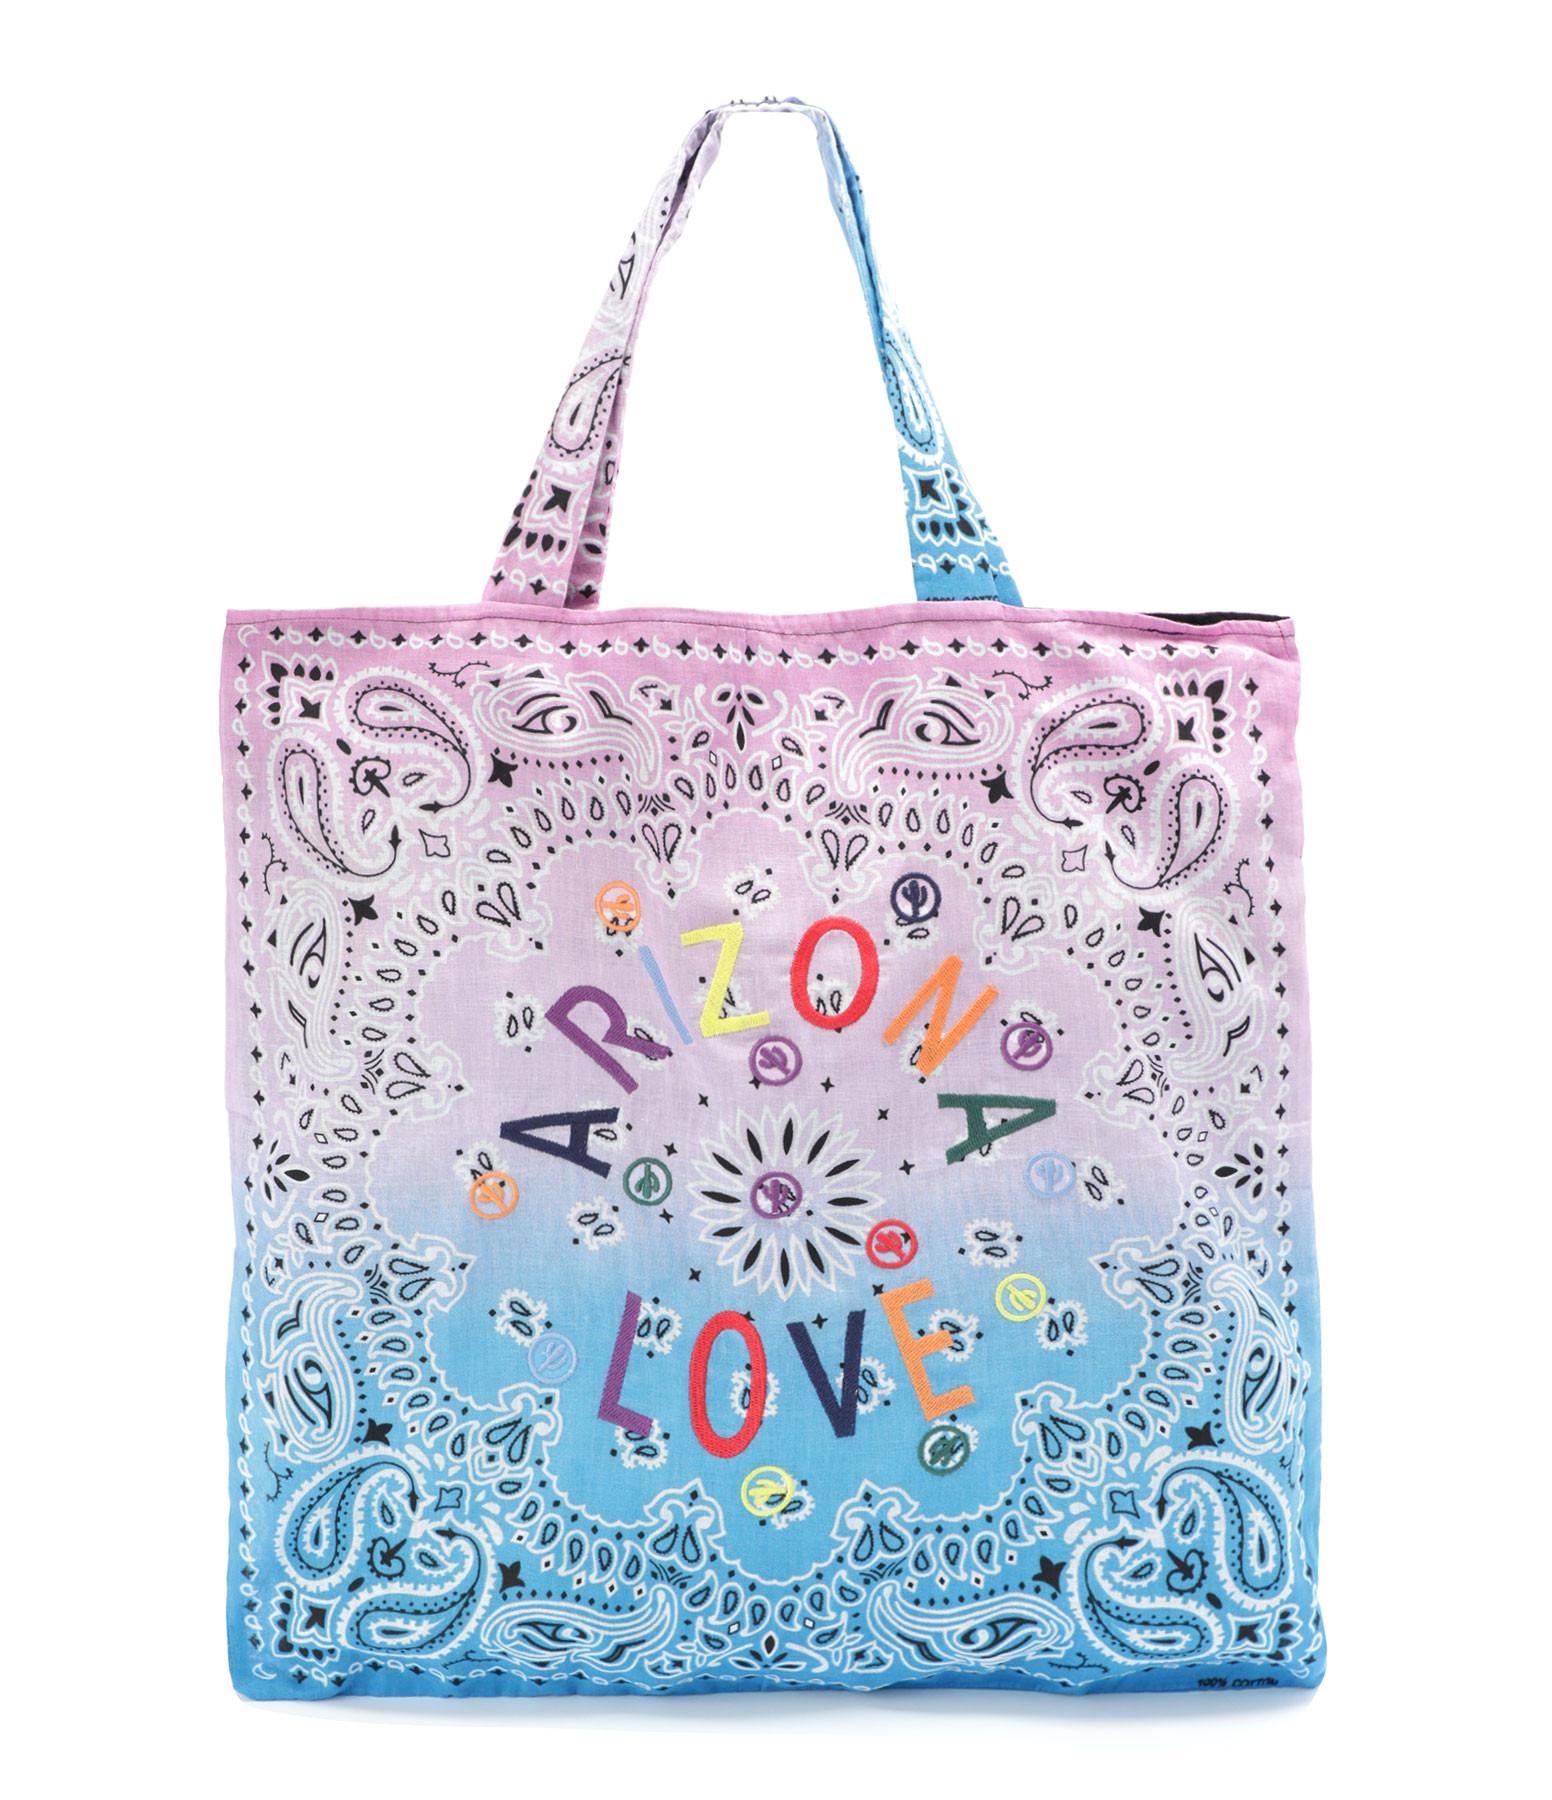 ARIZONA LOVE - Sac Tote Bag Beach Broderie Rose